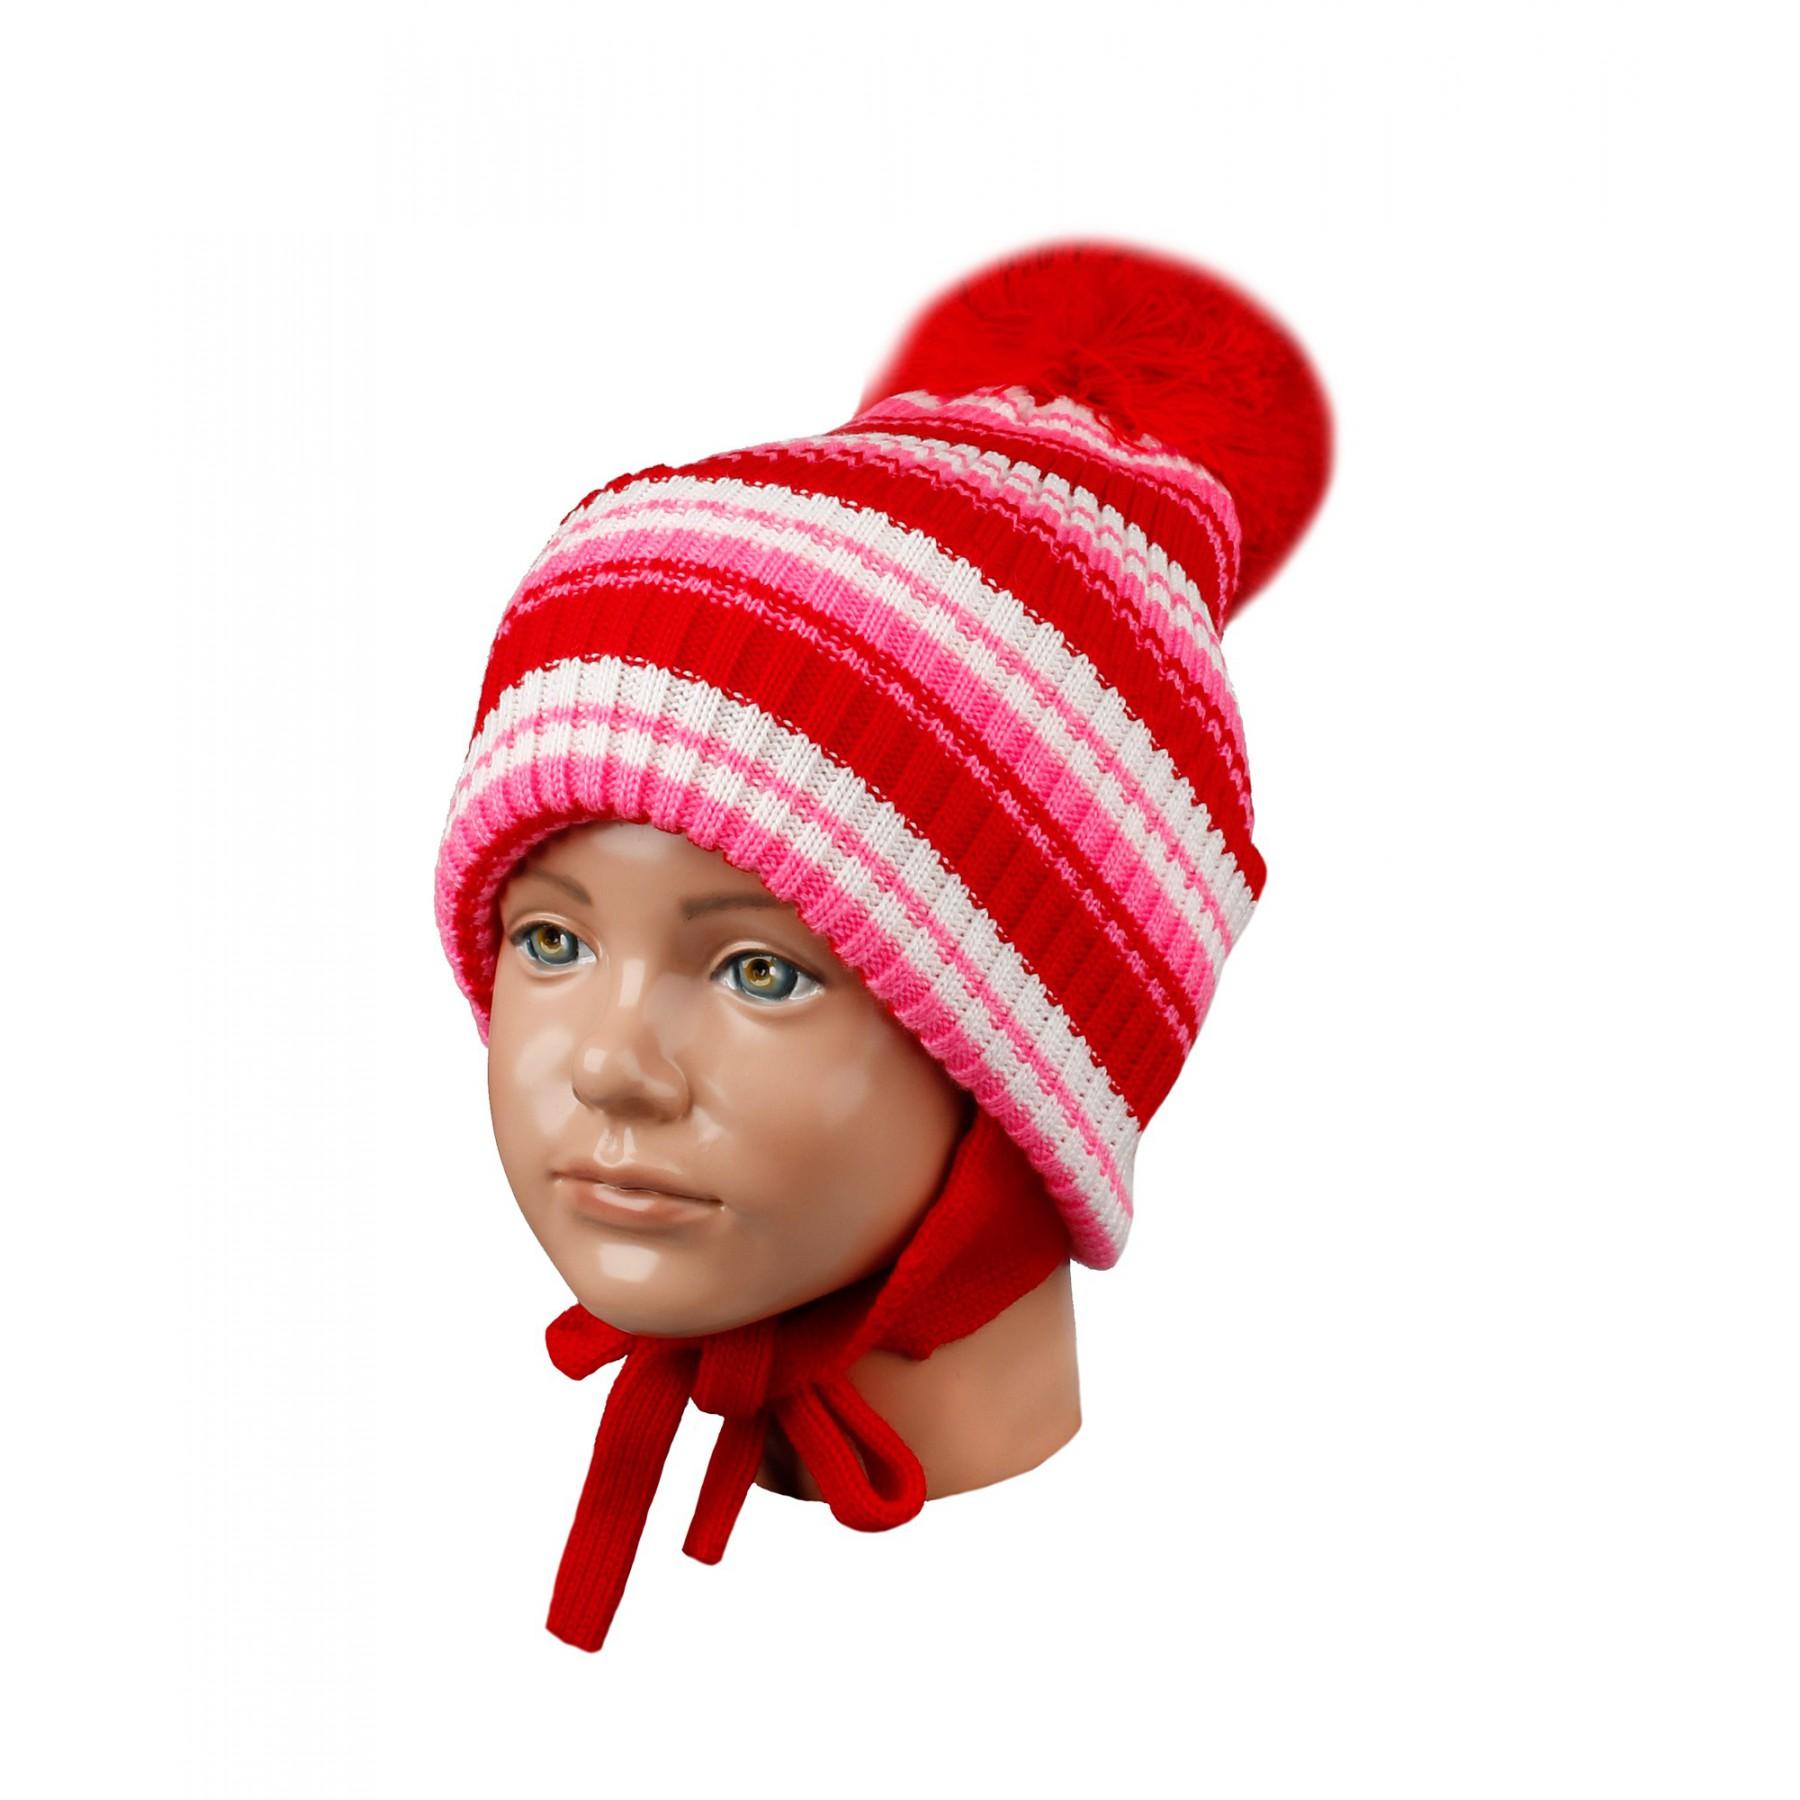 Будь модной! детские шапки. Модная одежда: http://makemoda.ru/detskie-shapki.html